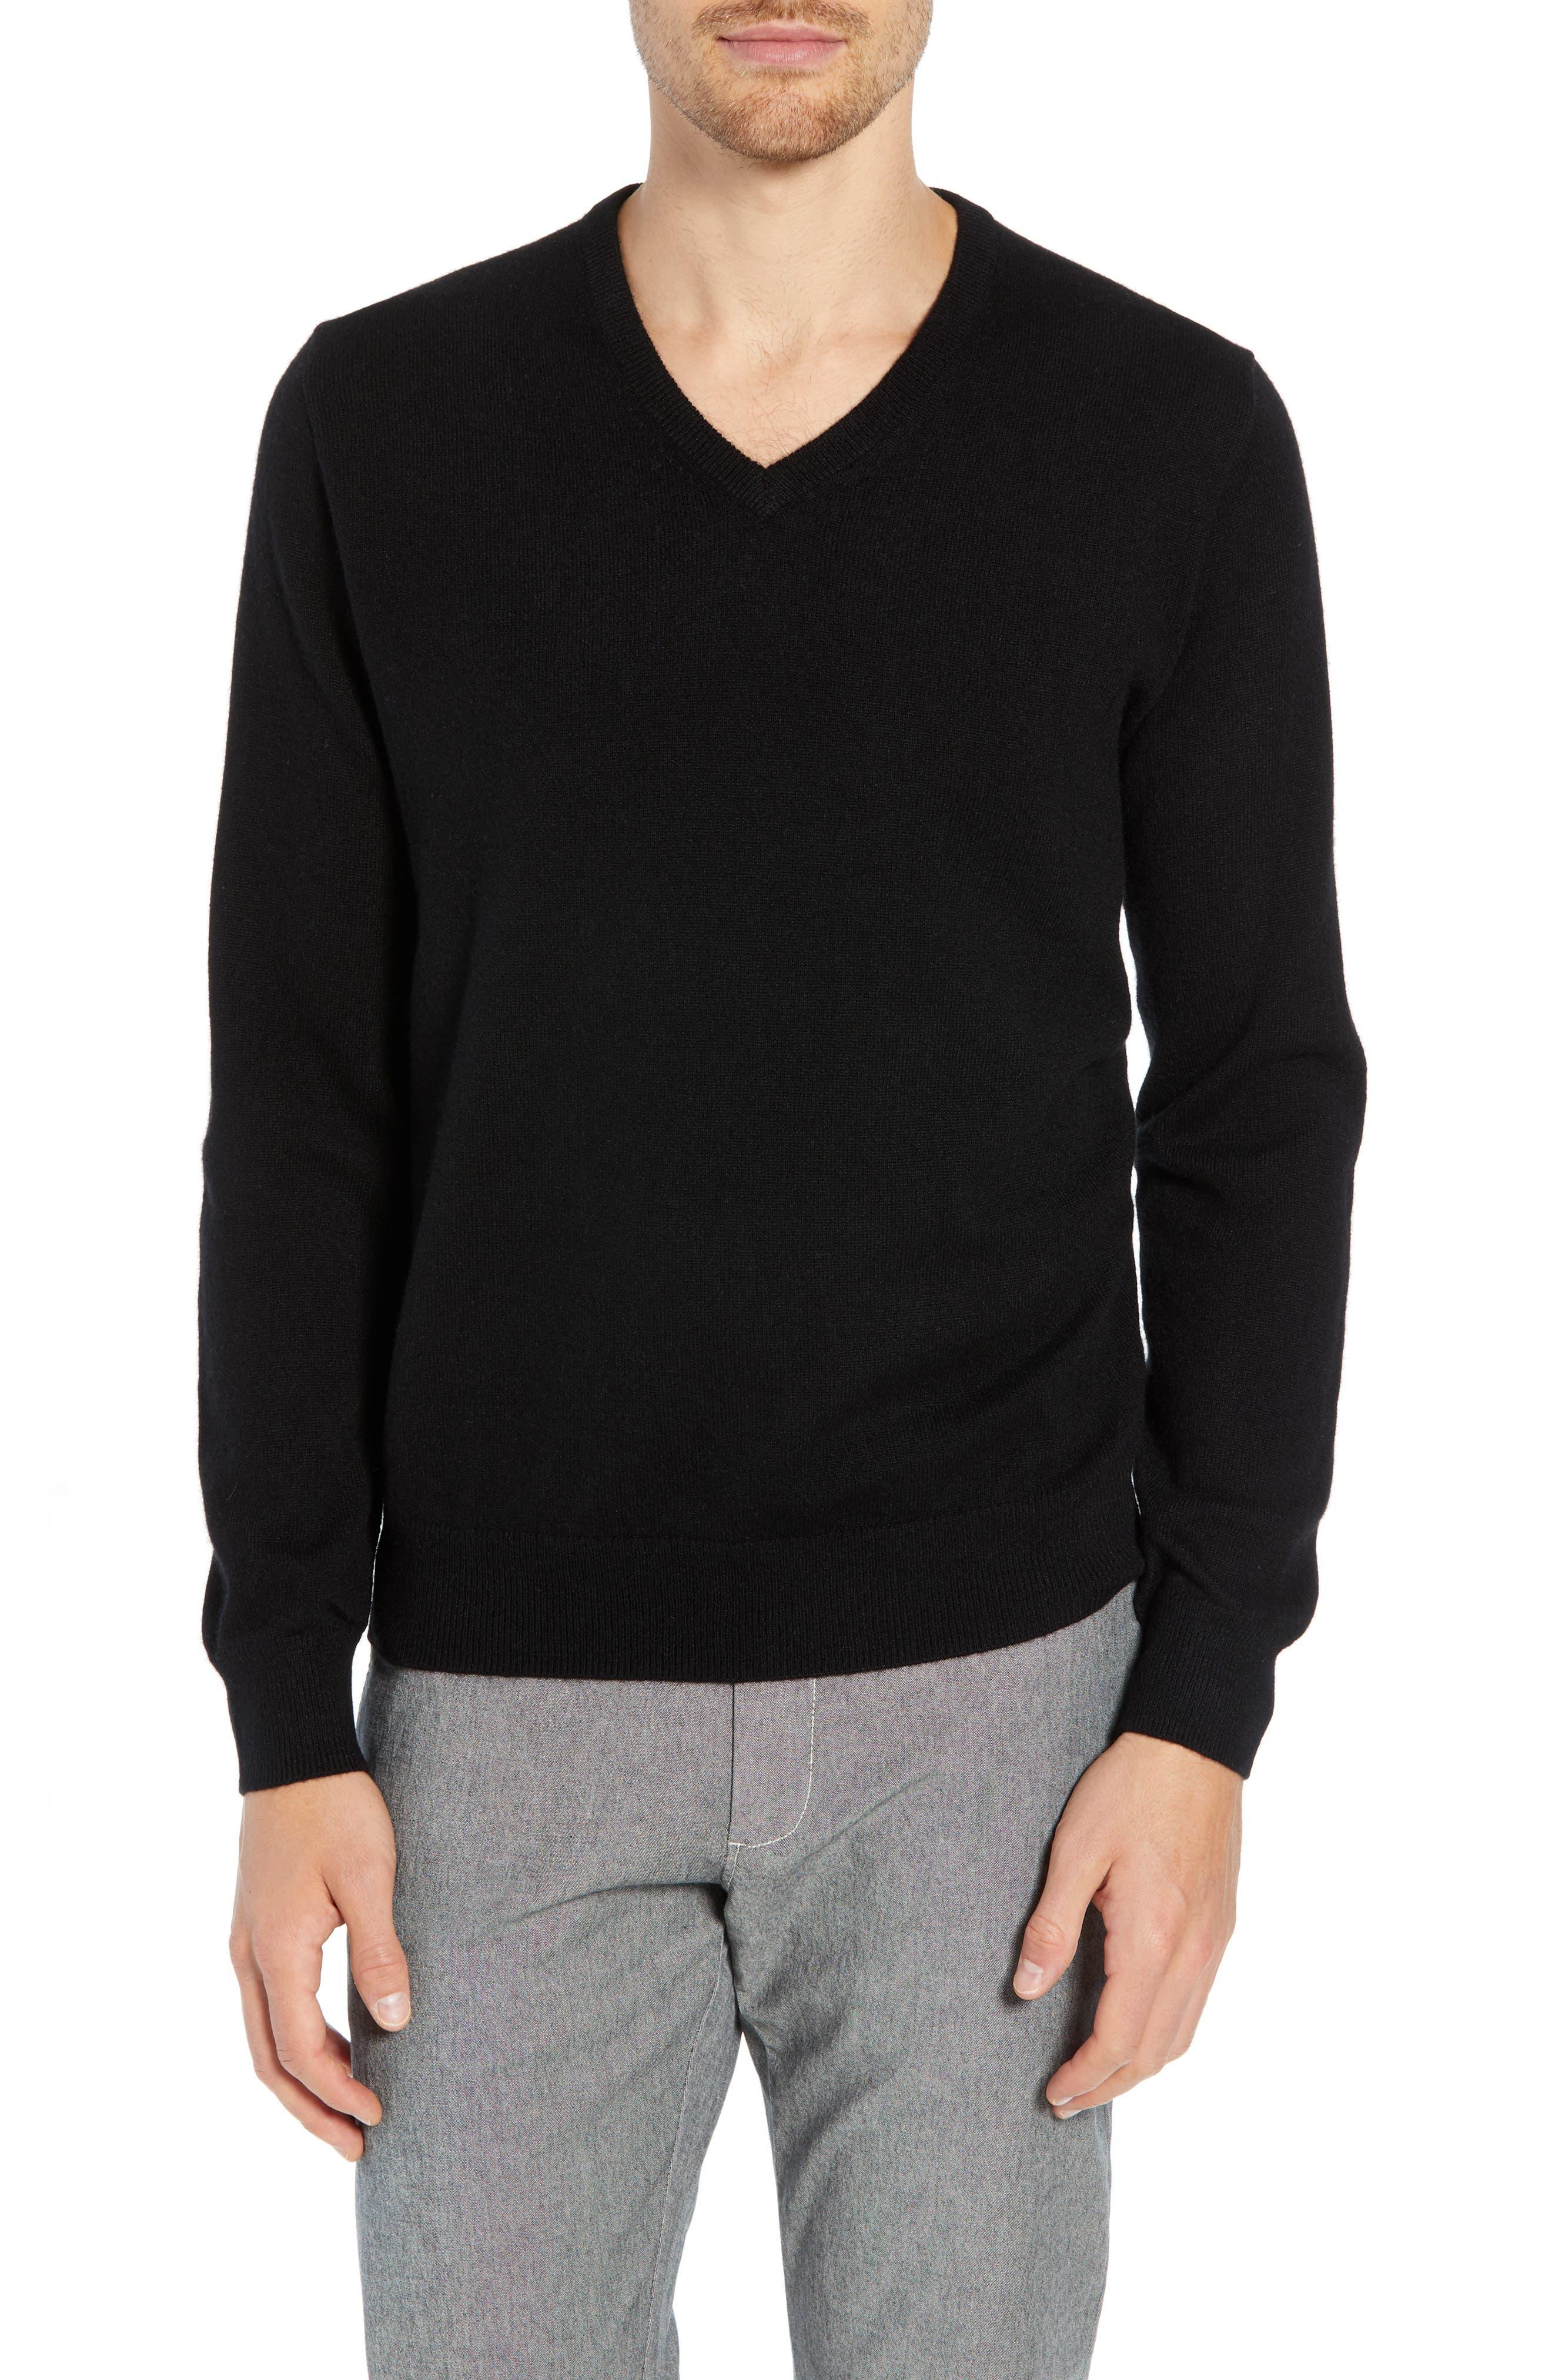 J.CREW Everyday Cashmere Regular Fit V-Neck Sweater, Main, color, 001